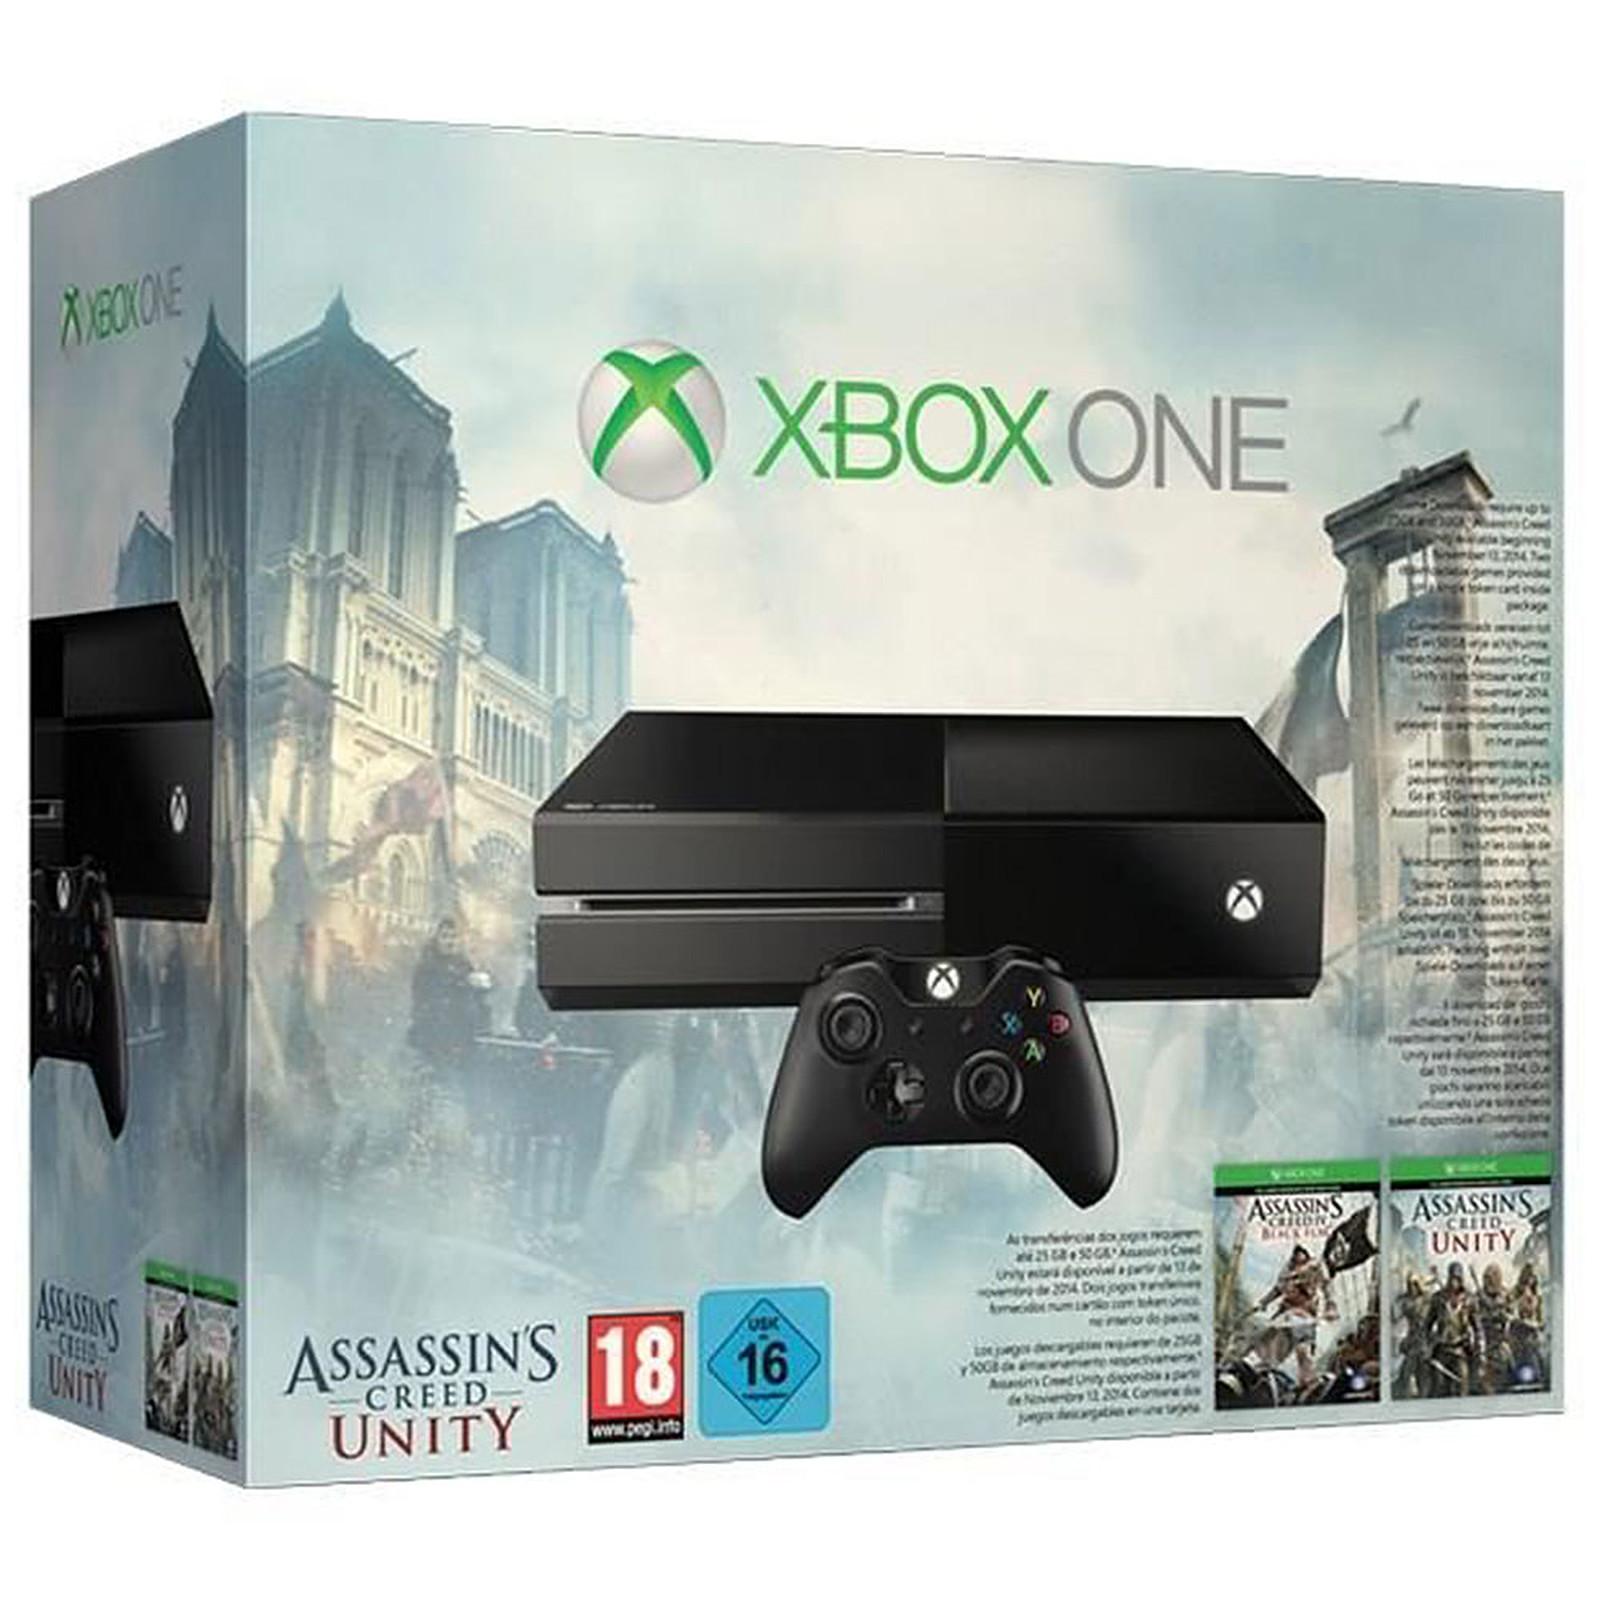 Microsoft Xbox One + Assassin's Creed (Assassin's Creed Unity + Assassin's Creed IV Black Flag)*